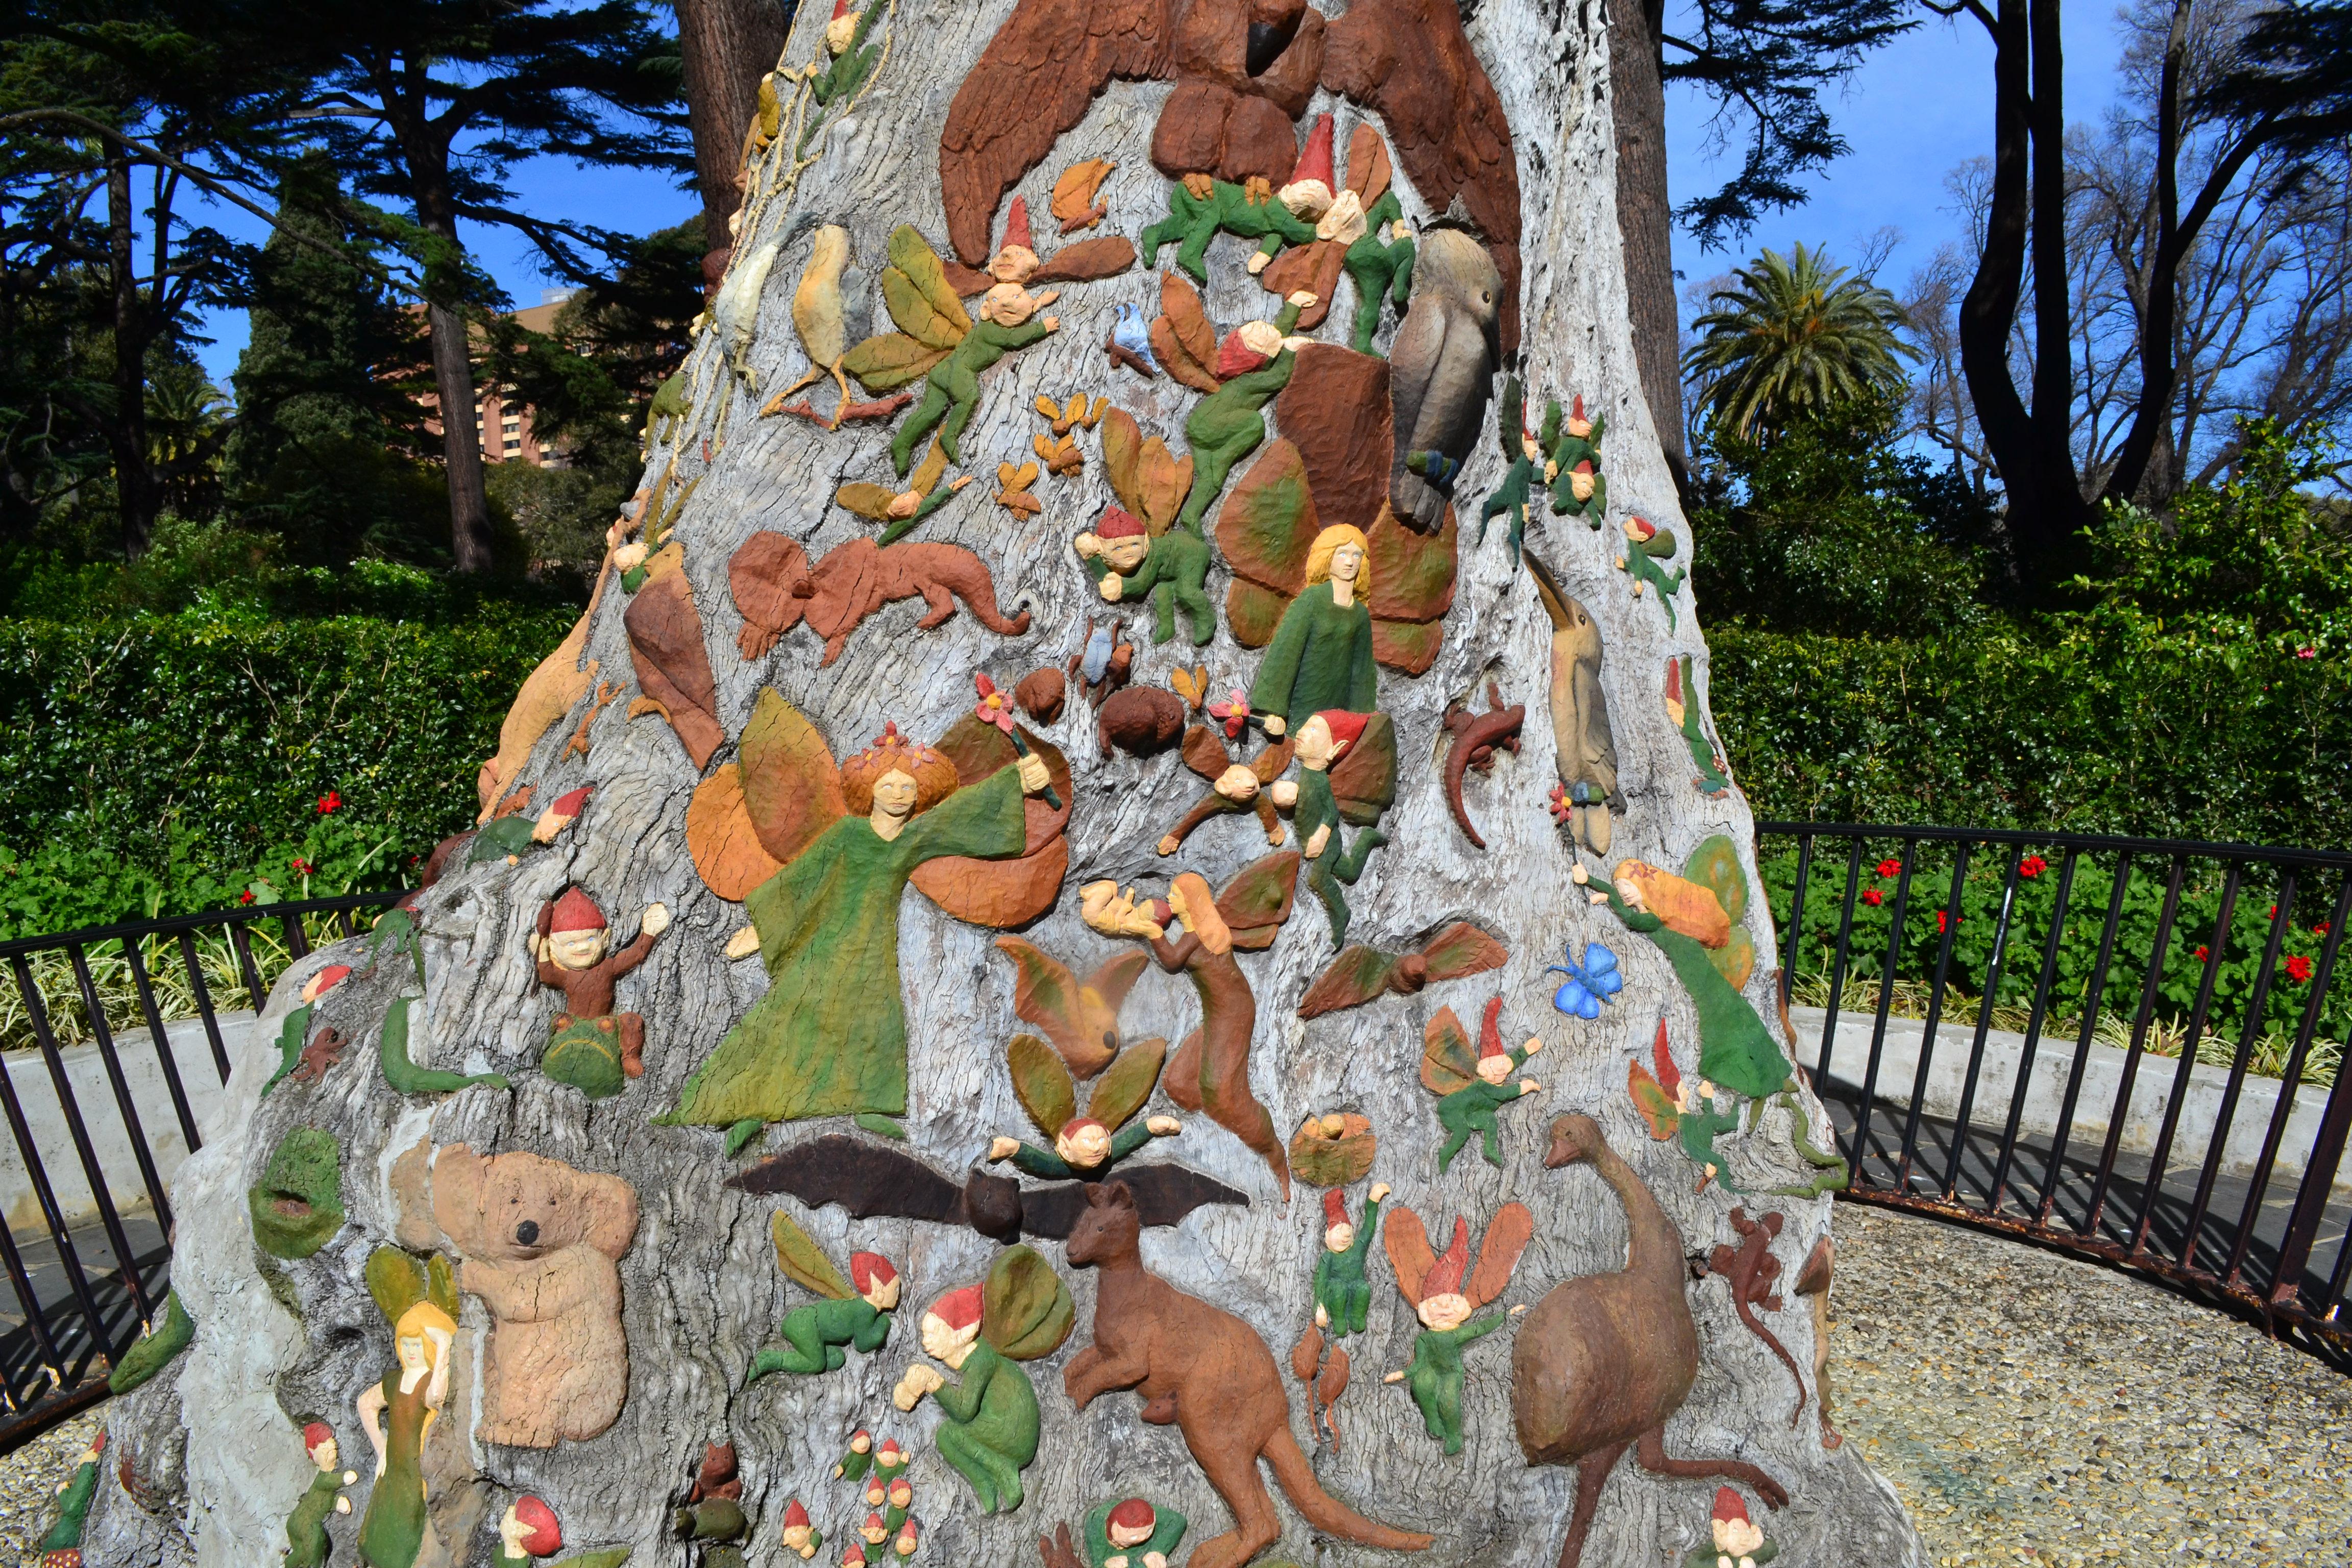 Fairies tree fitzroy gardens leanne s delicious food and travel - Fairies Tree Fitzroy Gardens